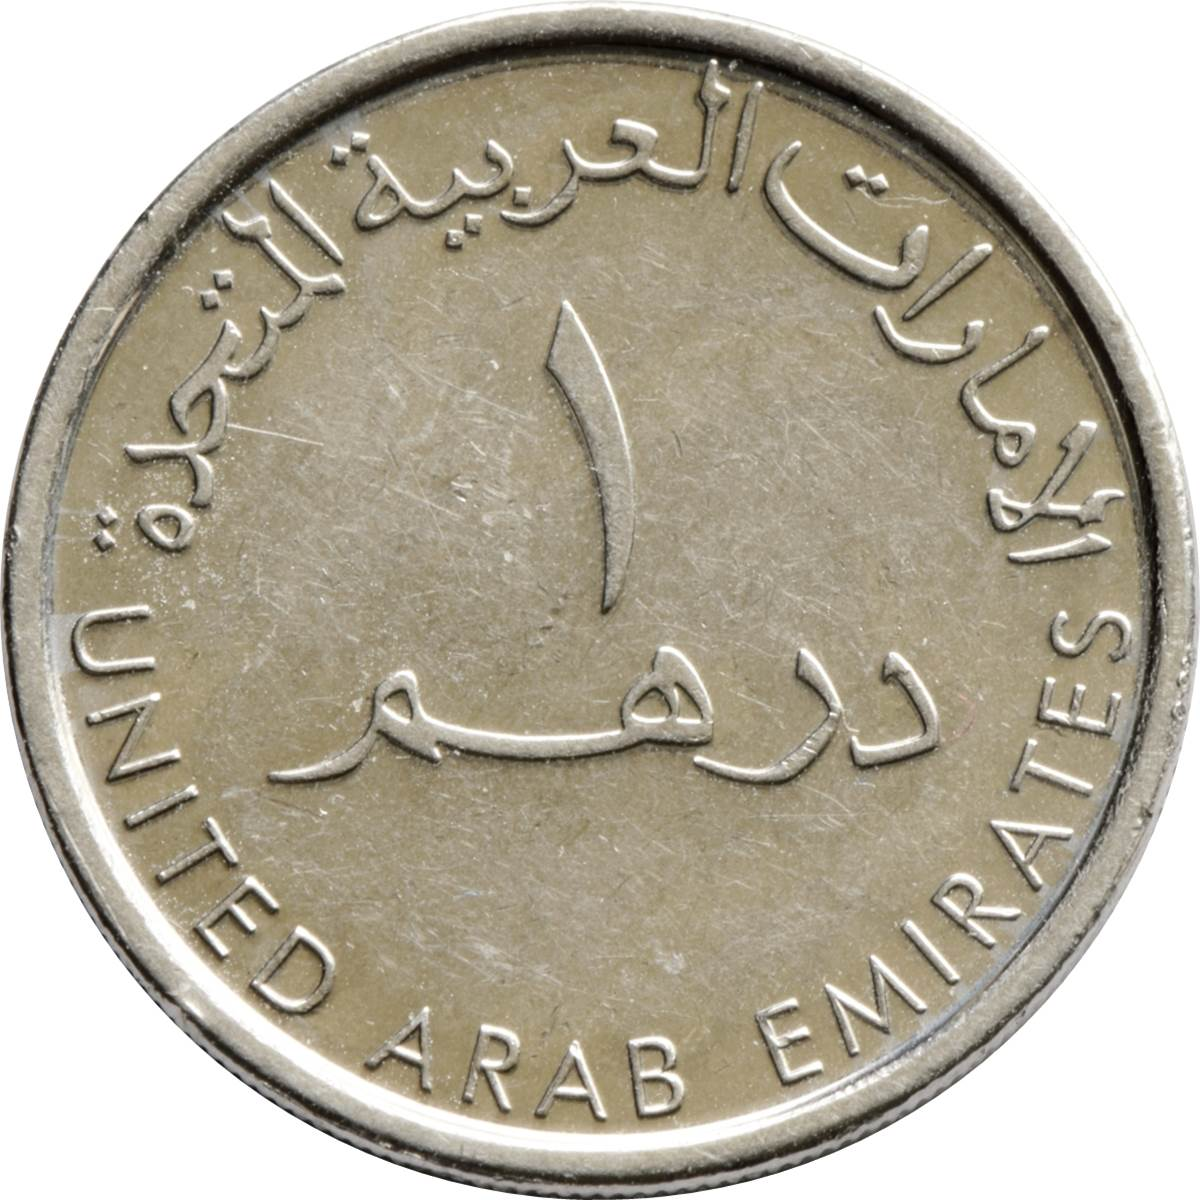 1 Dirham Khalifa Small Type Magnetic